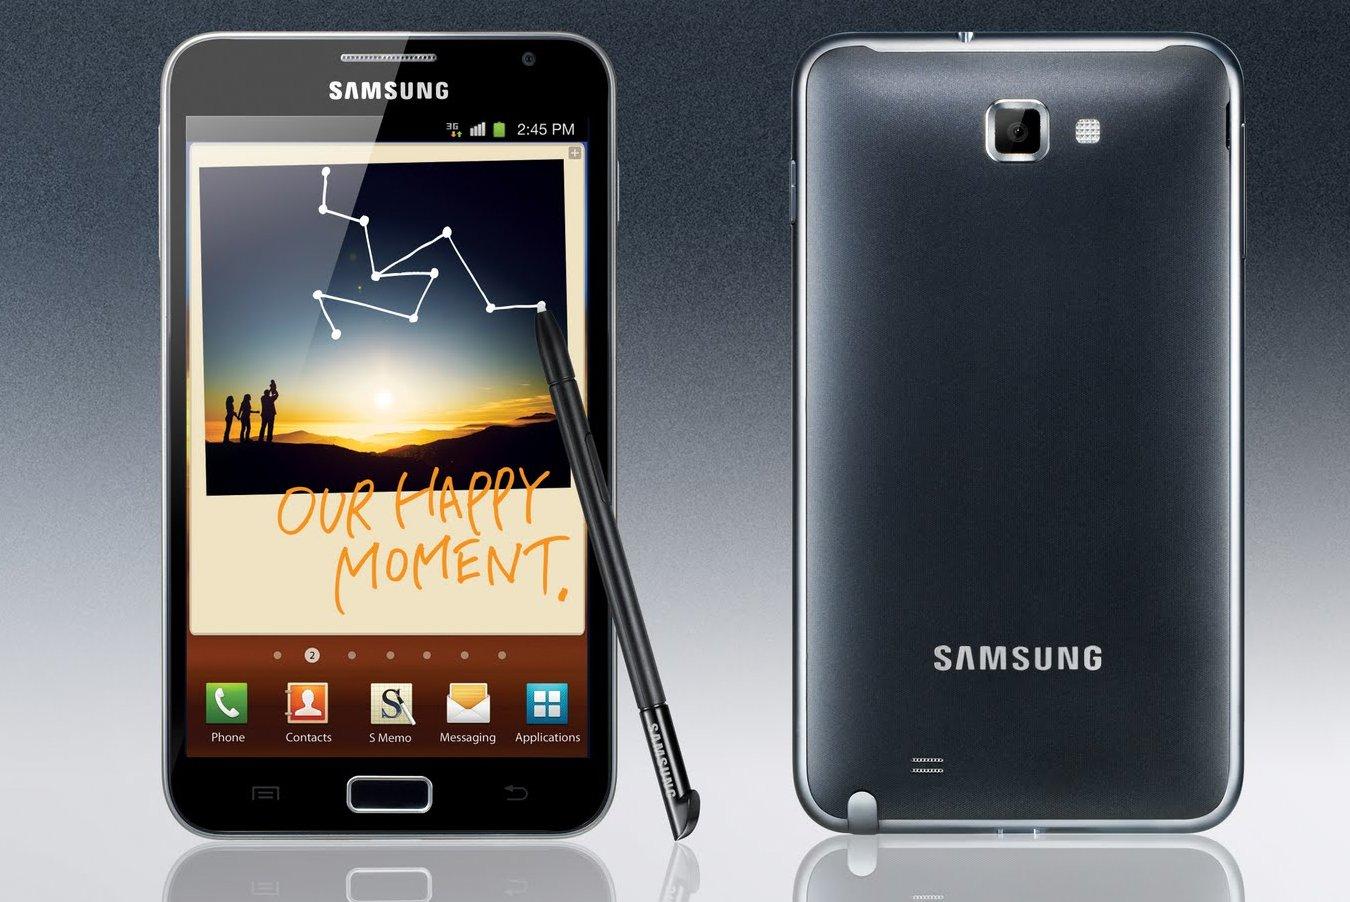 "BRAND NEW Samsung Galaxy NOTE! AMAZING PRICE! EU MODEL! HUGE 5.3"" SUPER AMOLED SCREEN!"